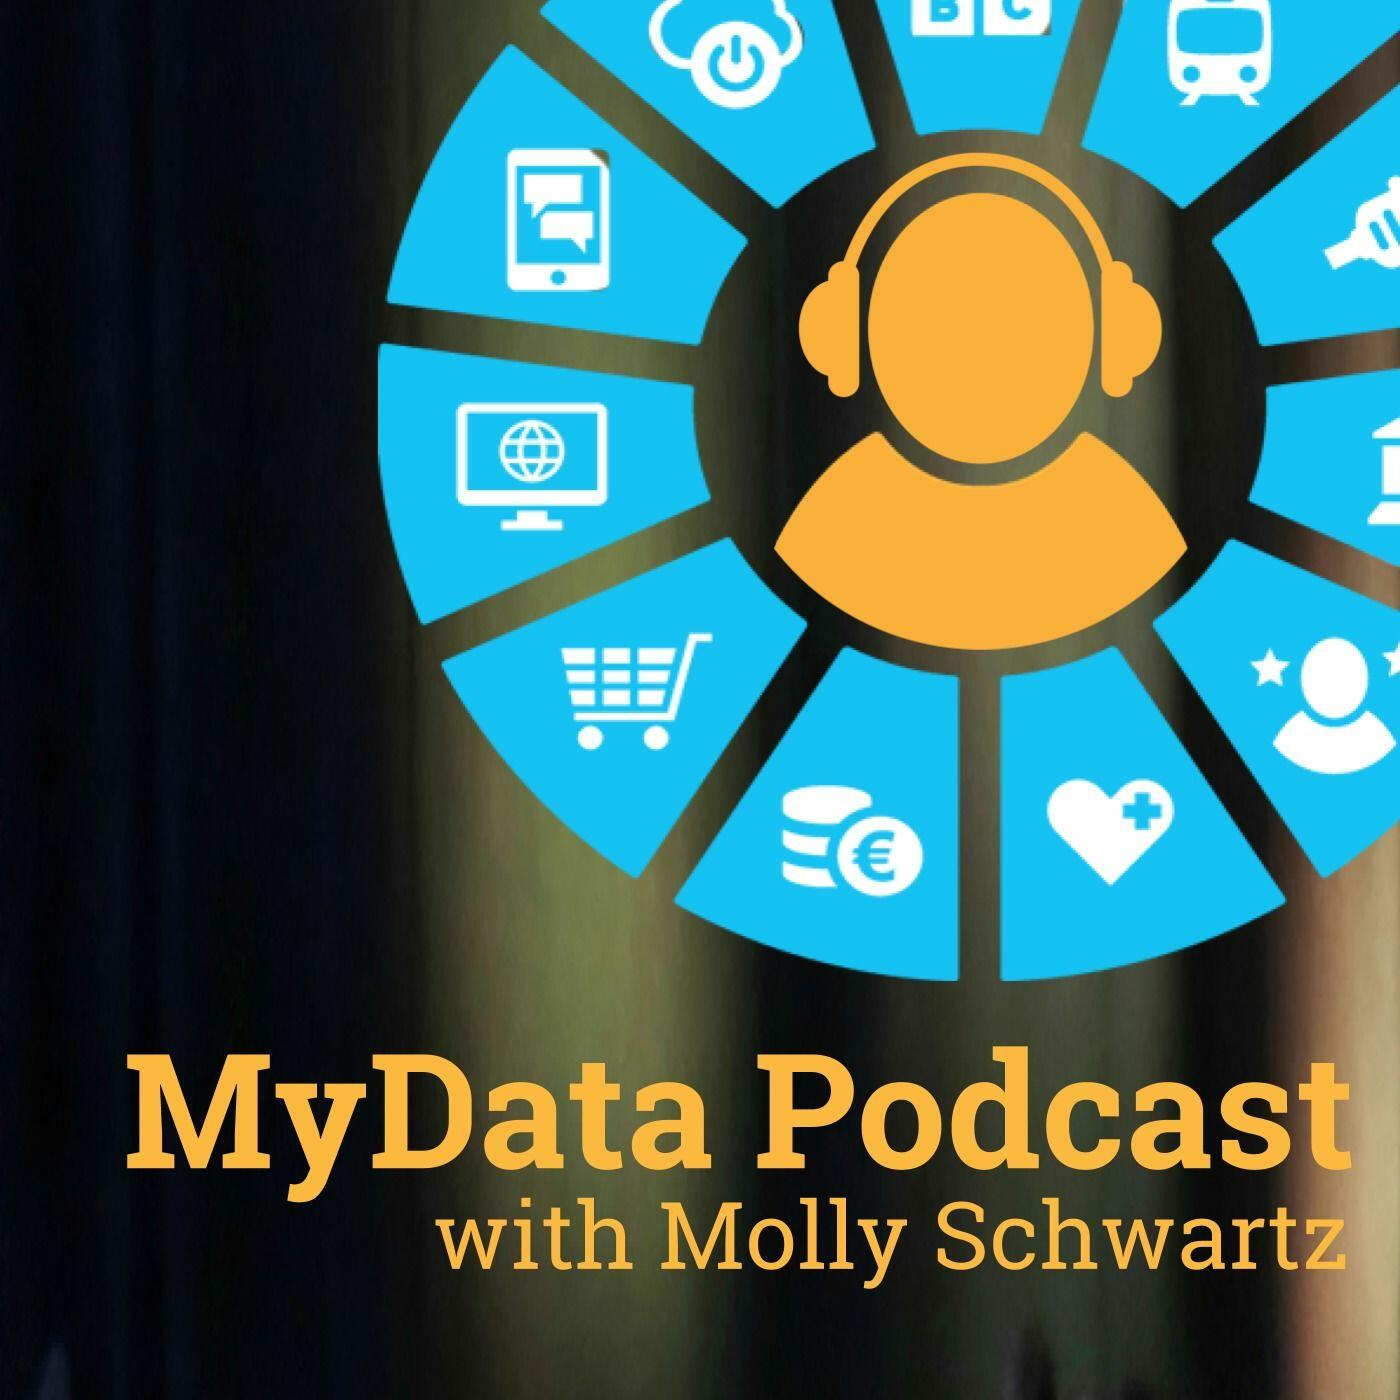 MyData Podcast